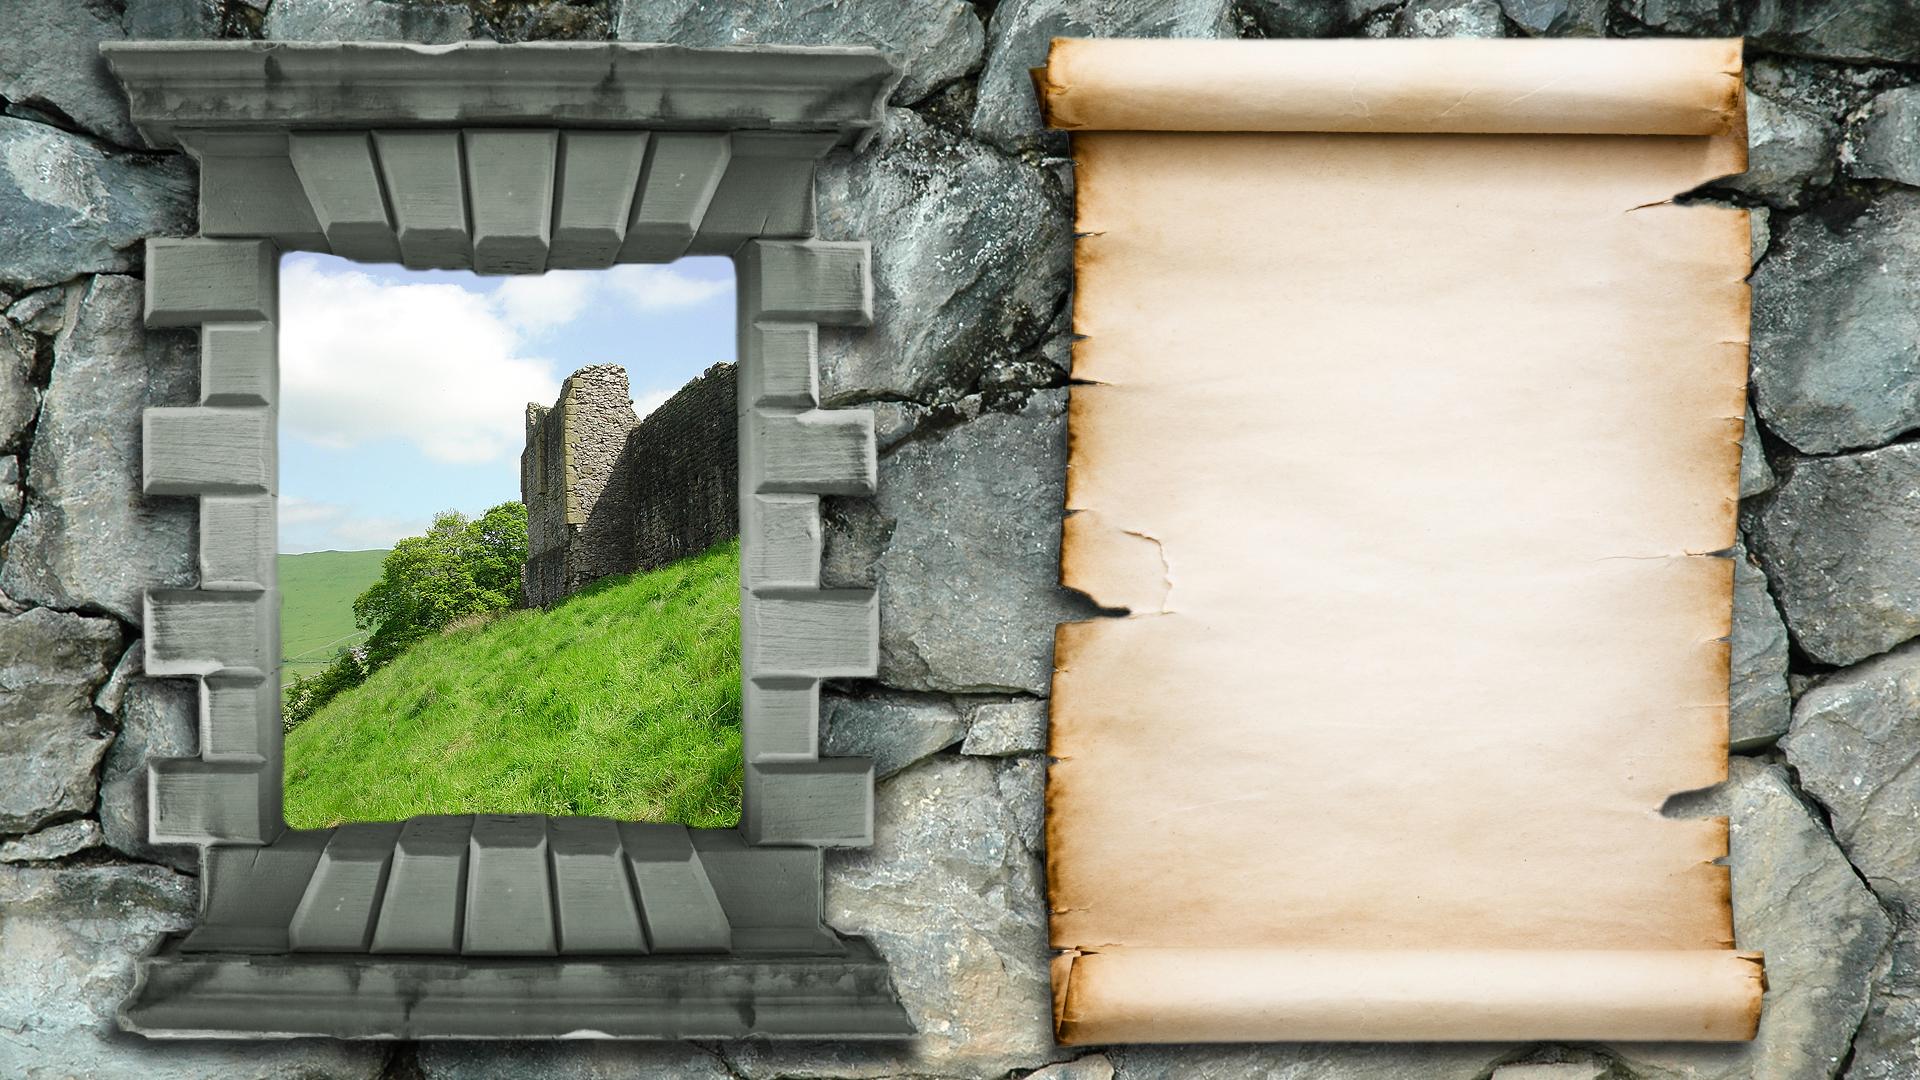 The Bard's Tale desktop background wallpaper by Mecandes